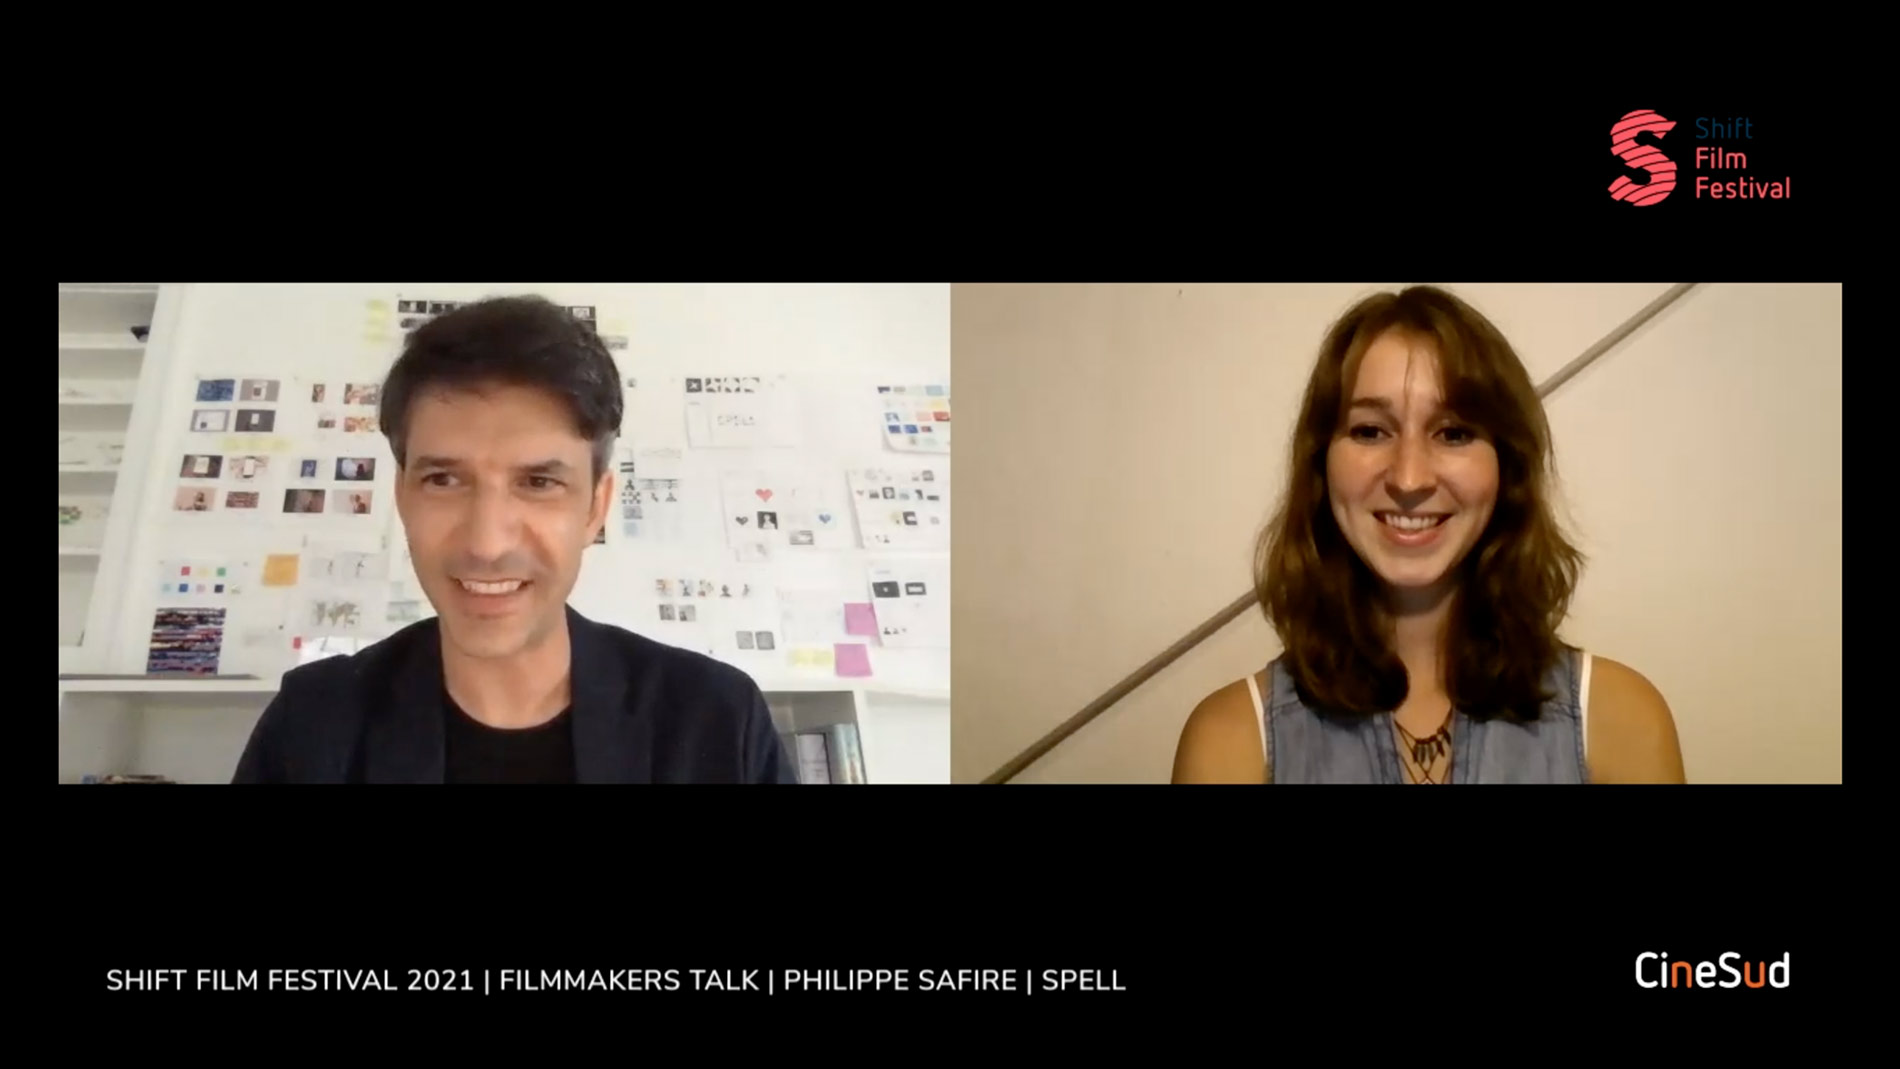 SHIFT Film Festival 2021 | Filmmakers Talk